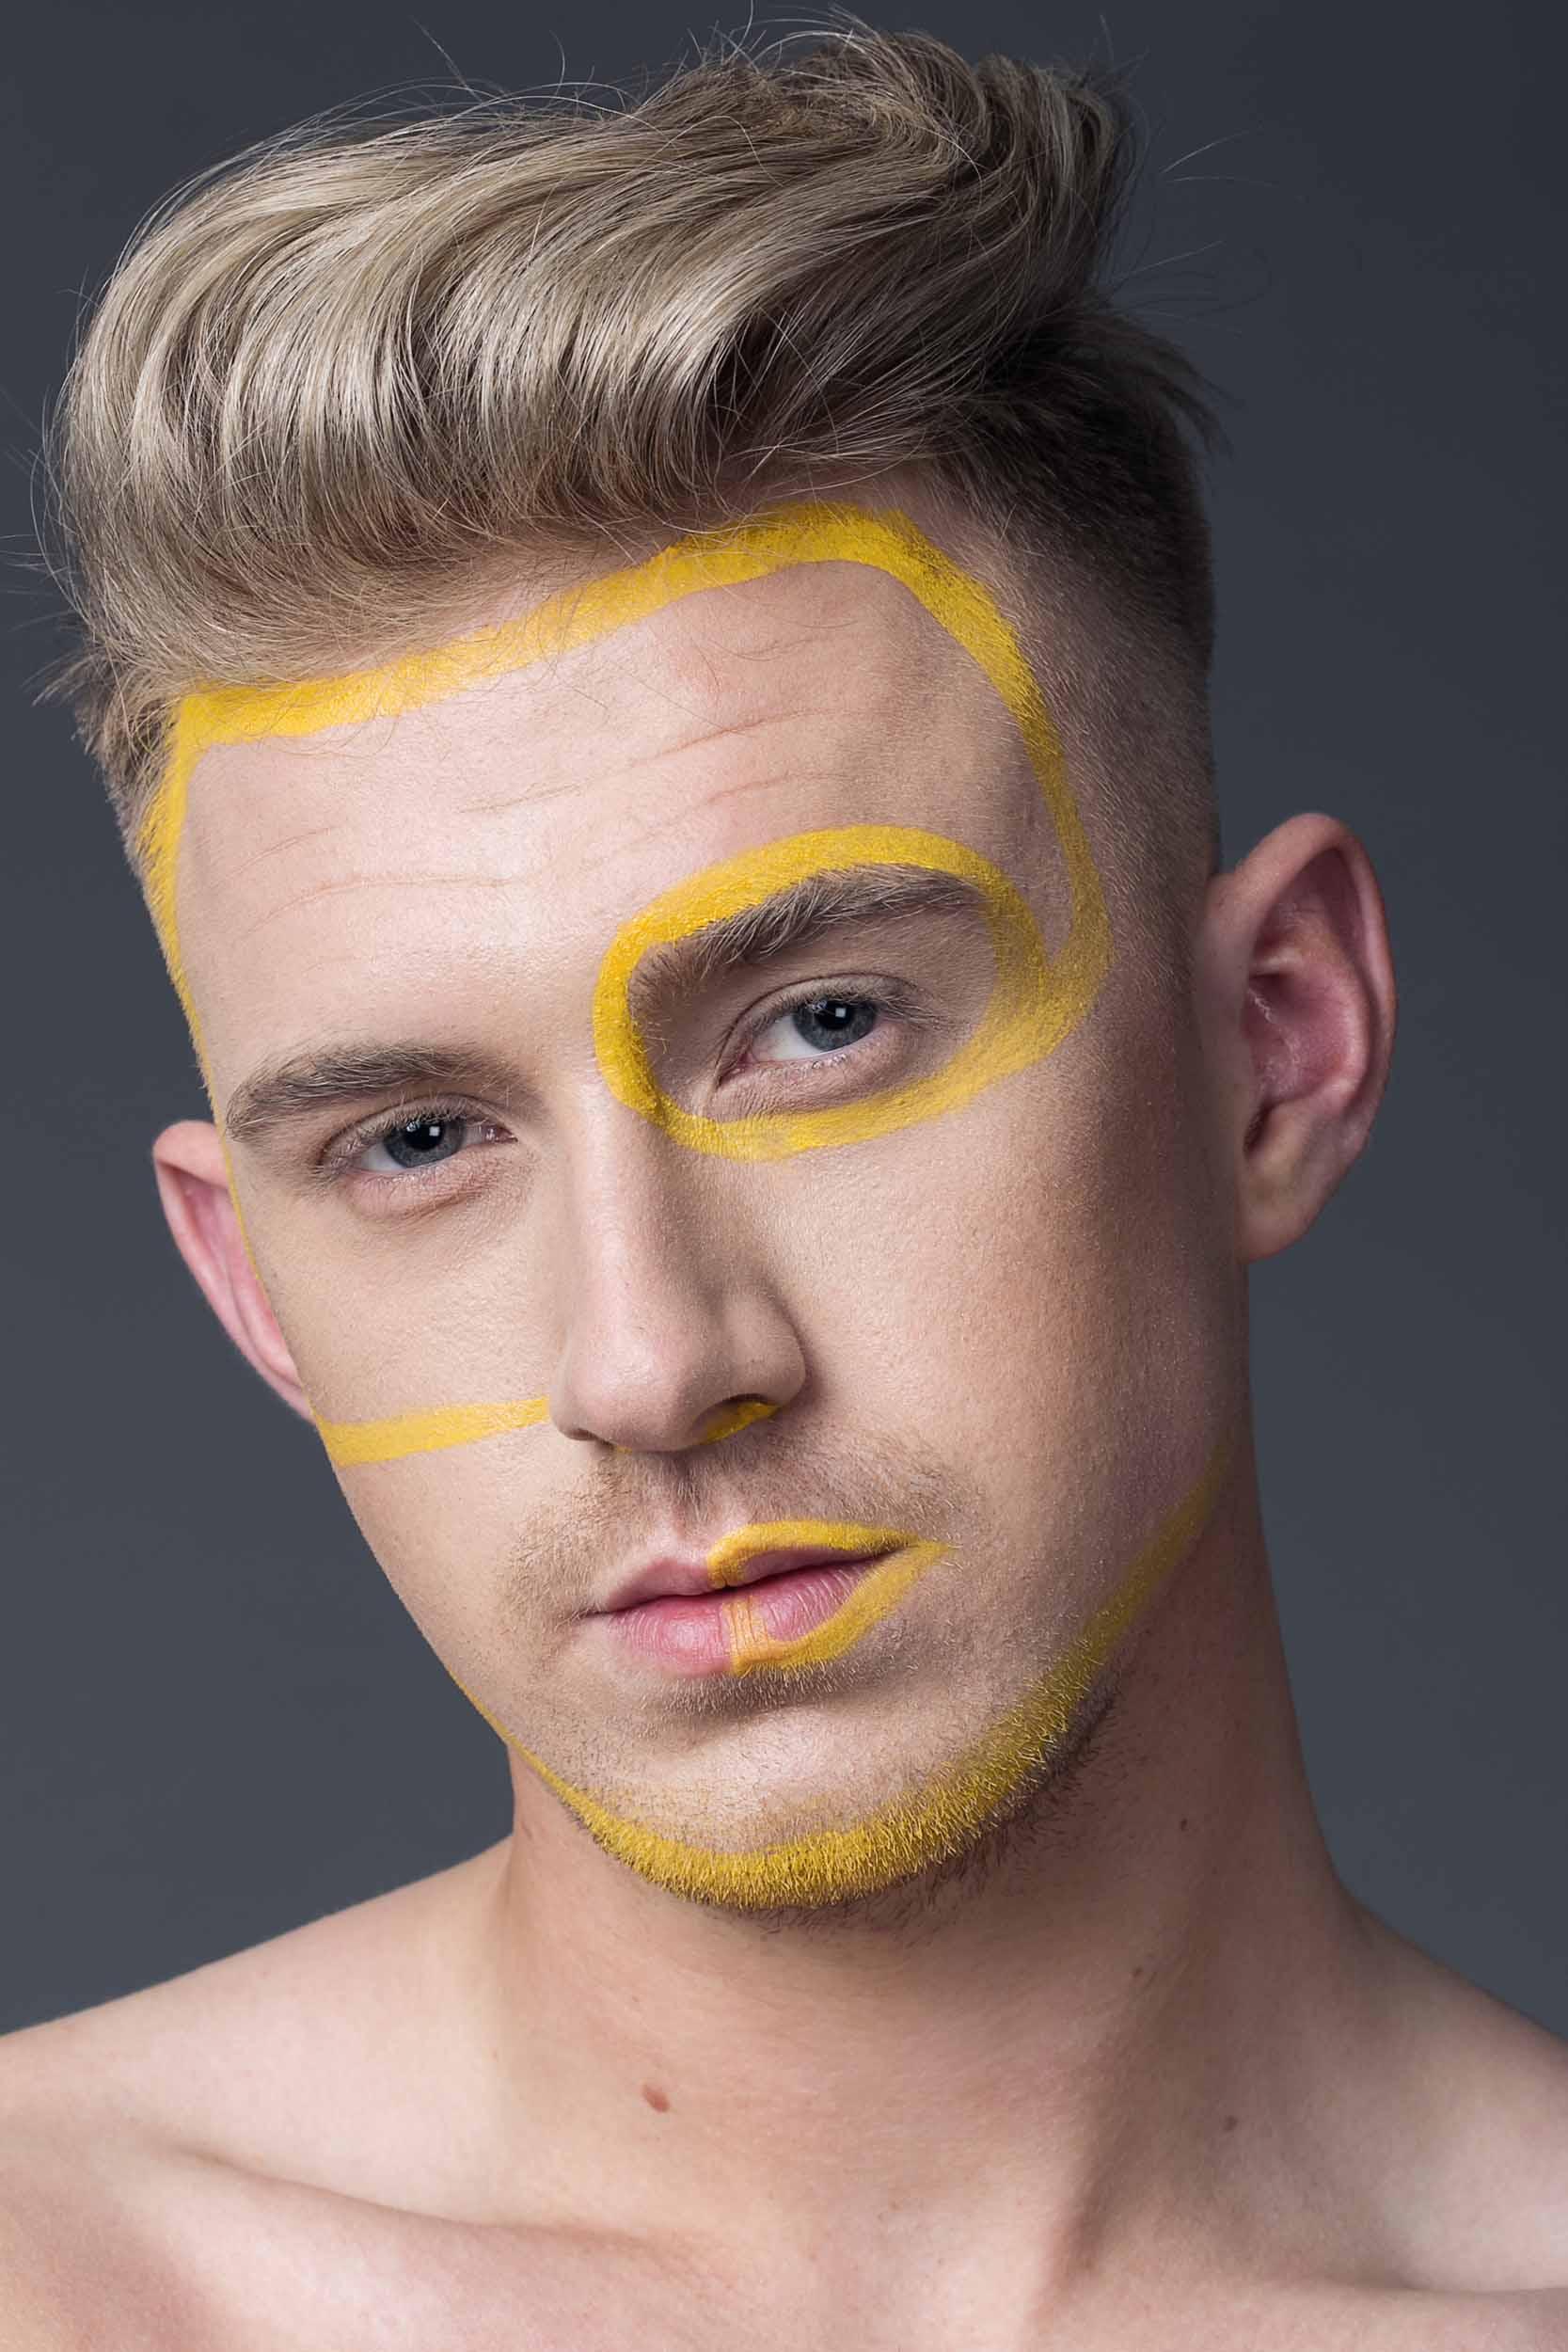 lauren-fletcher-beauty-test-shoot-web-005-copyright-lauren-fletcher.jpg